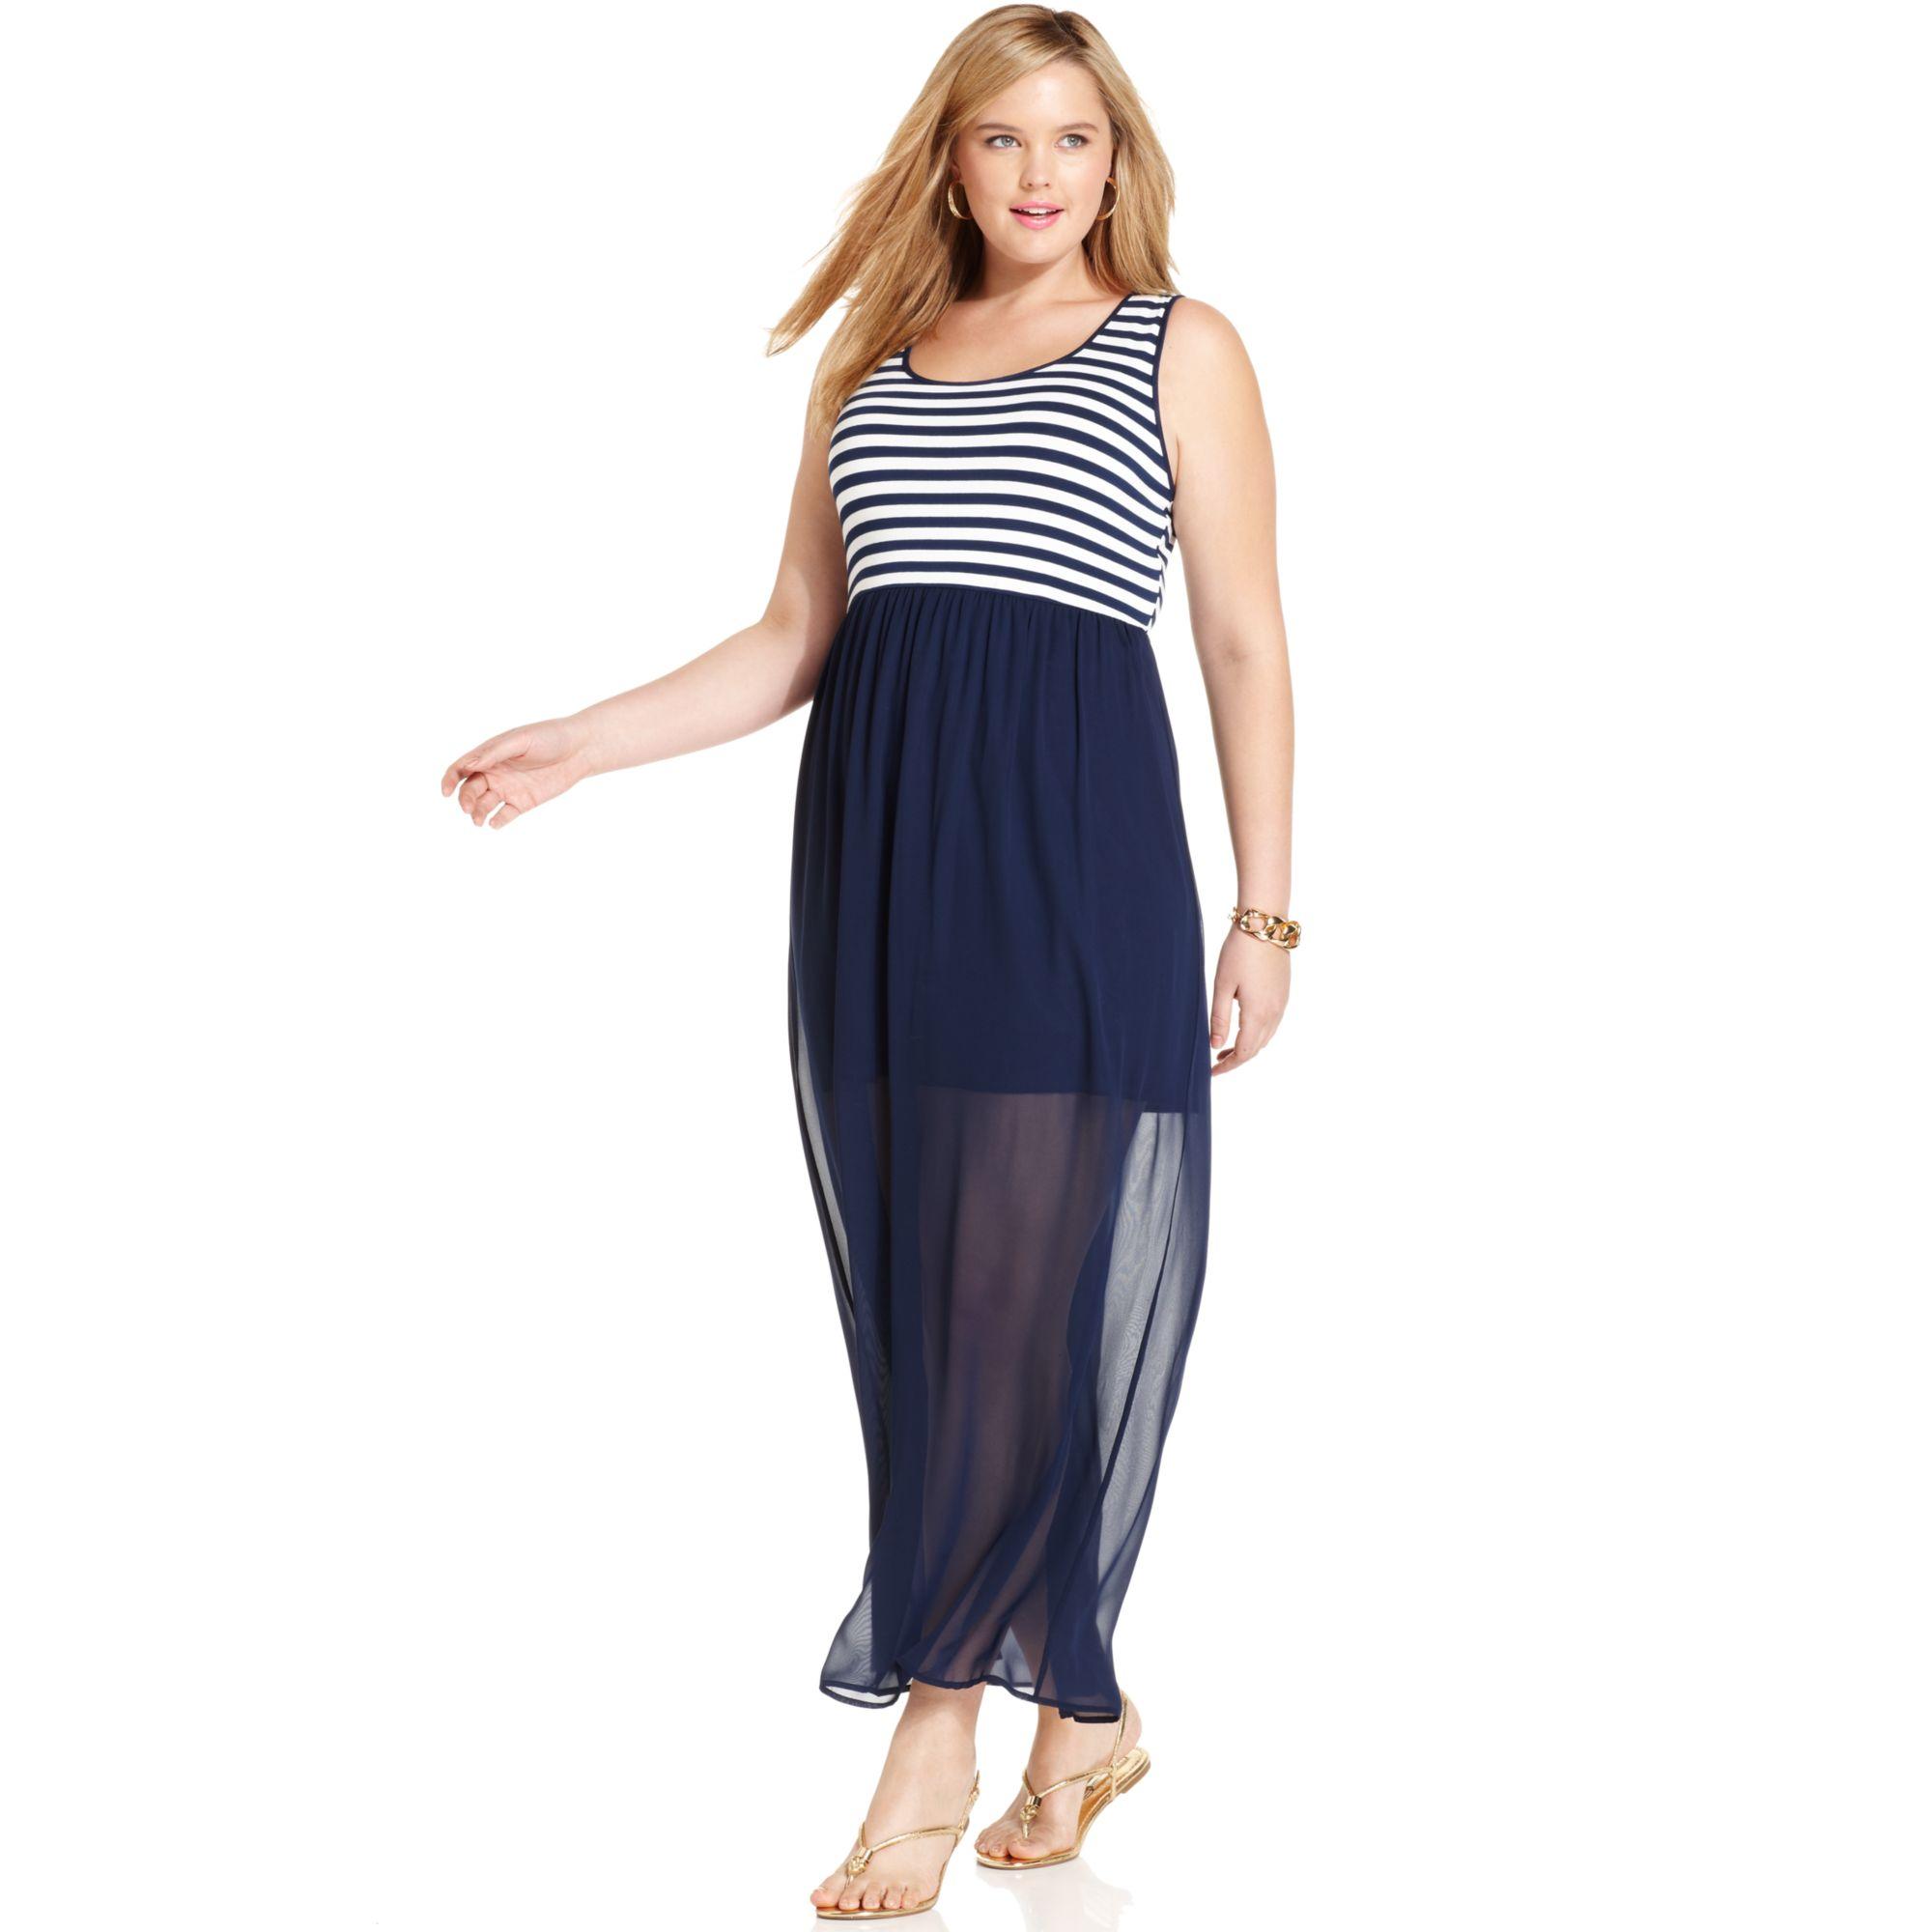 Soprano Plus Size Clothing